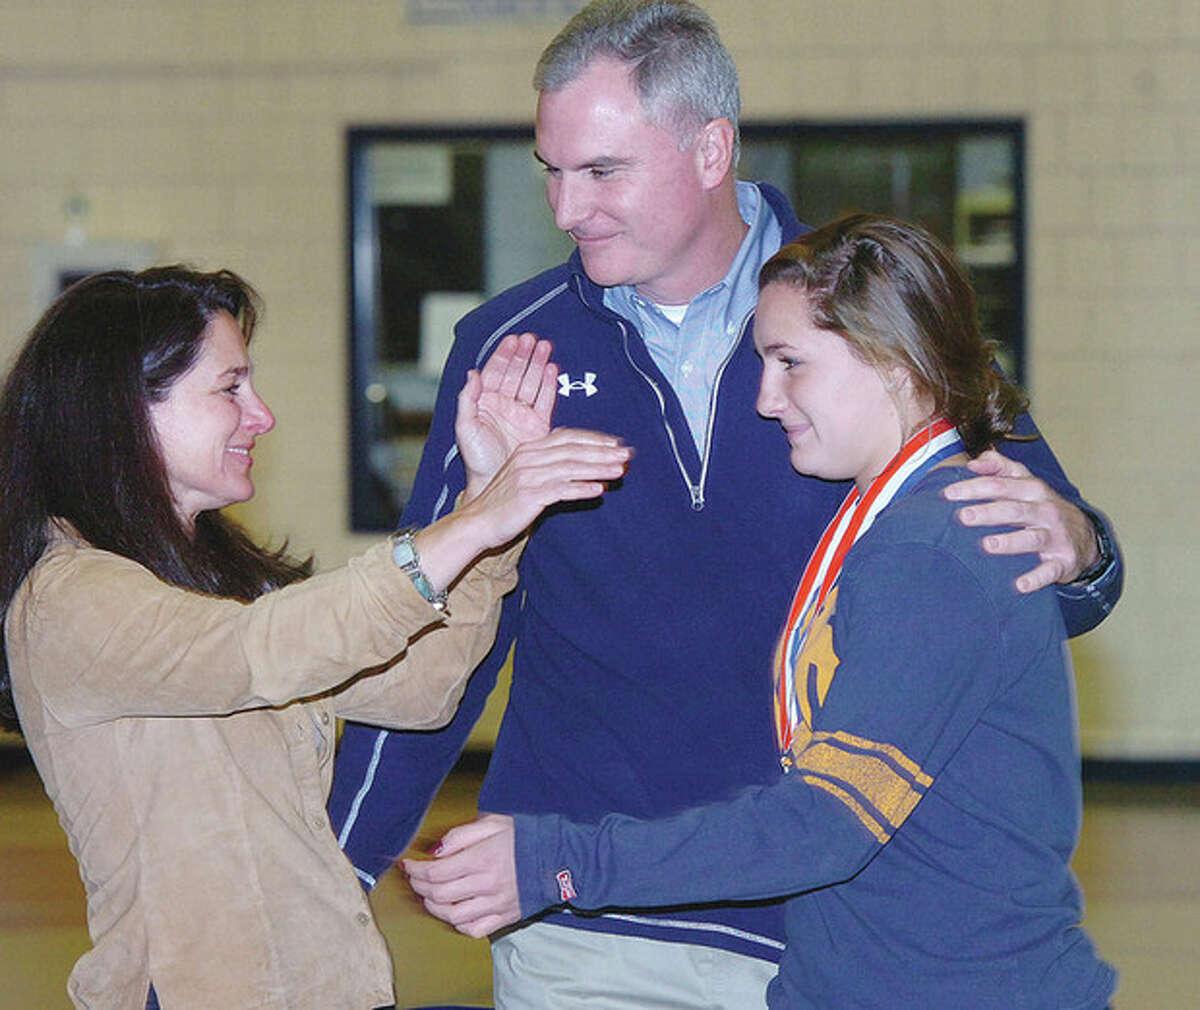 Hour Photo Alex von Kleydorff; Parents Karen and Steve embrace Casey Pearsall at the Wendy's Heisman Trophy announcement